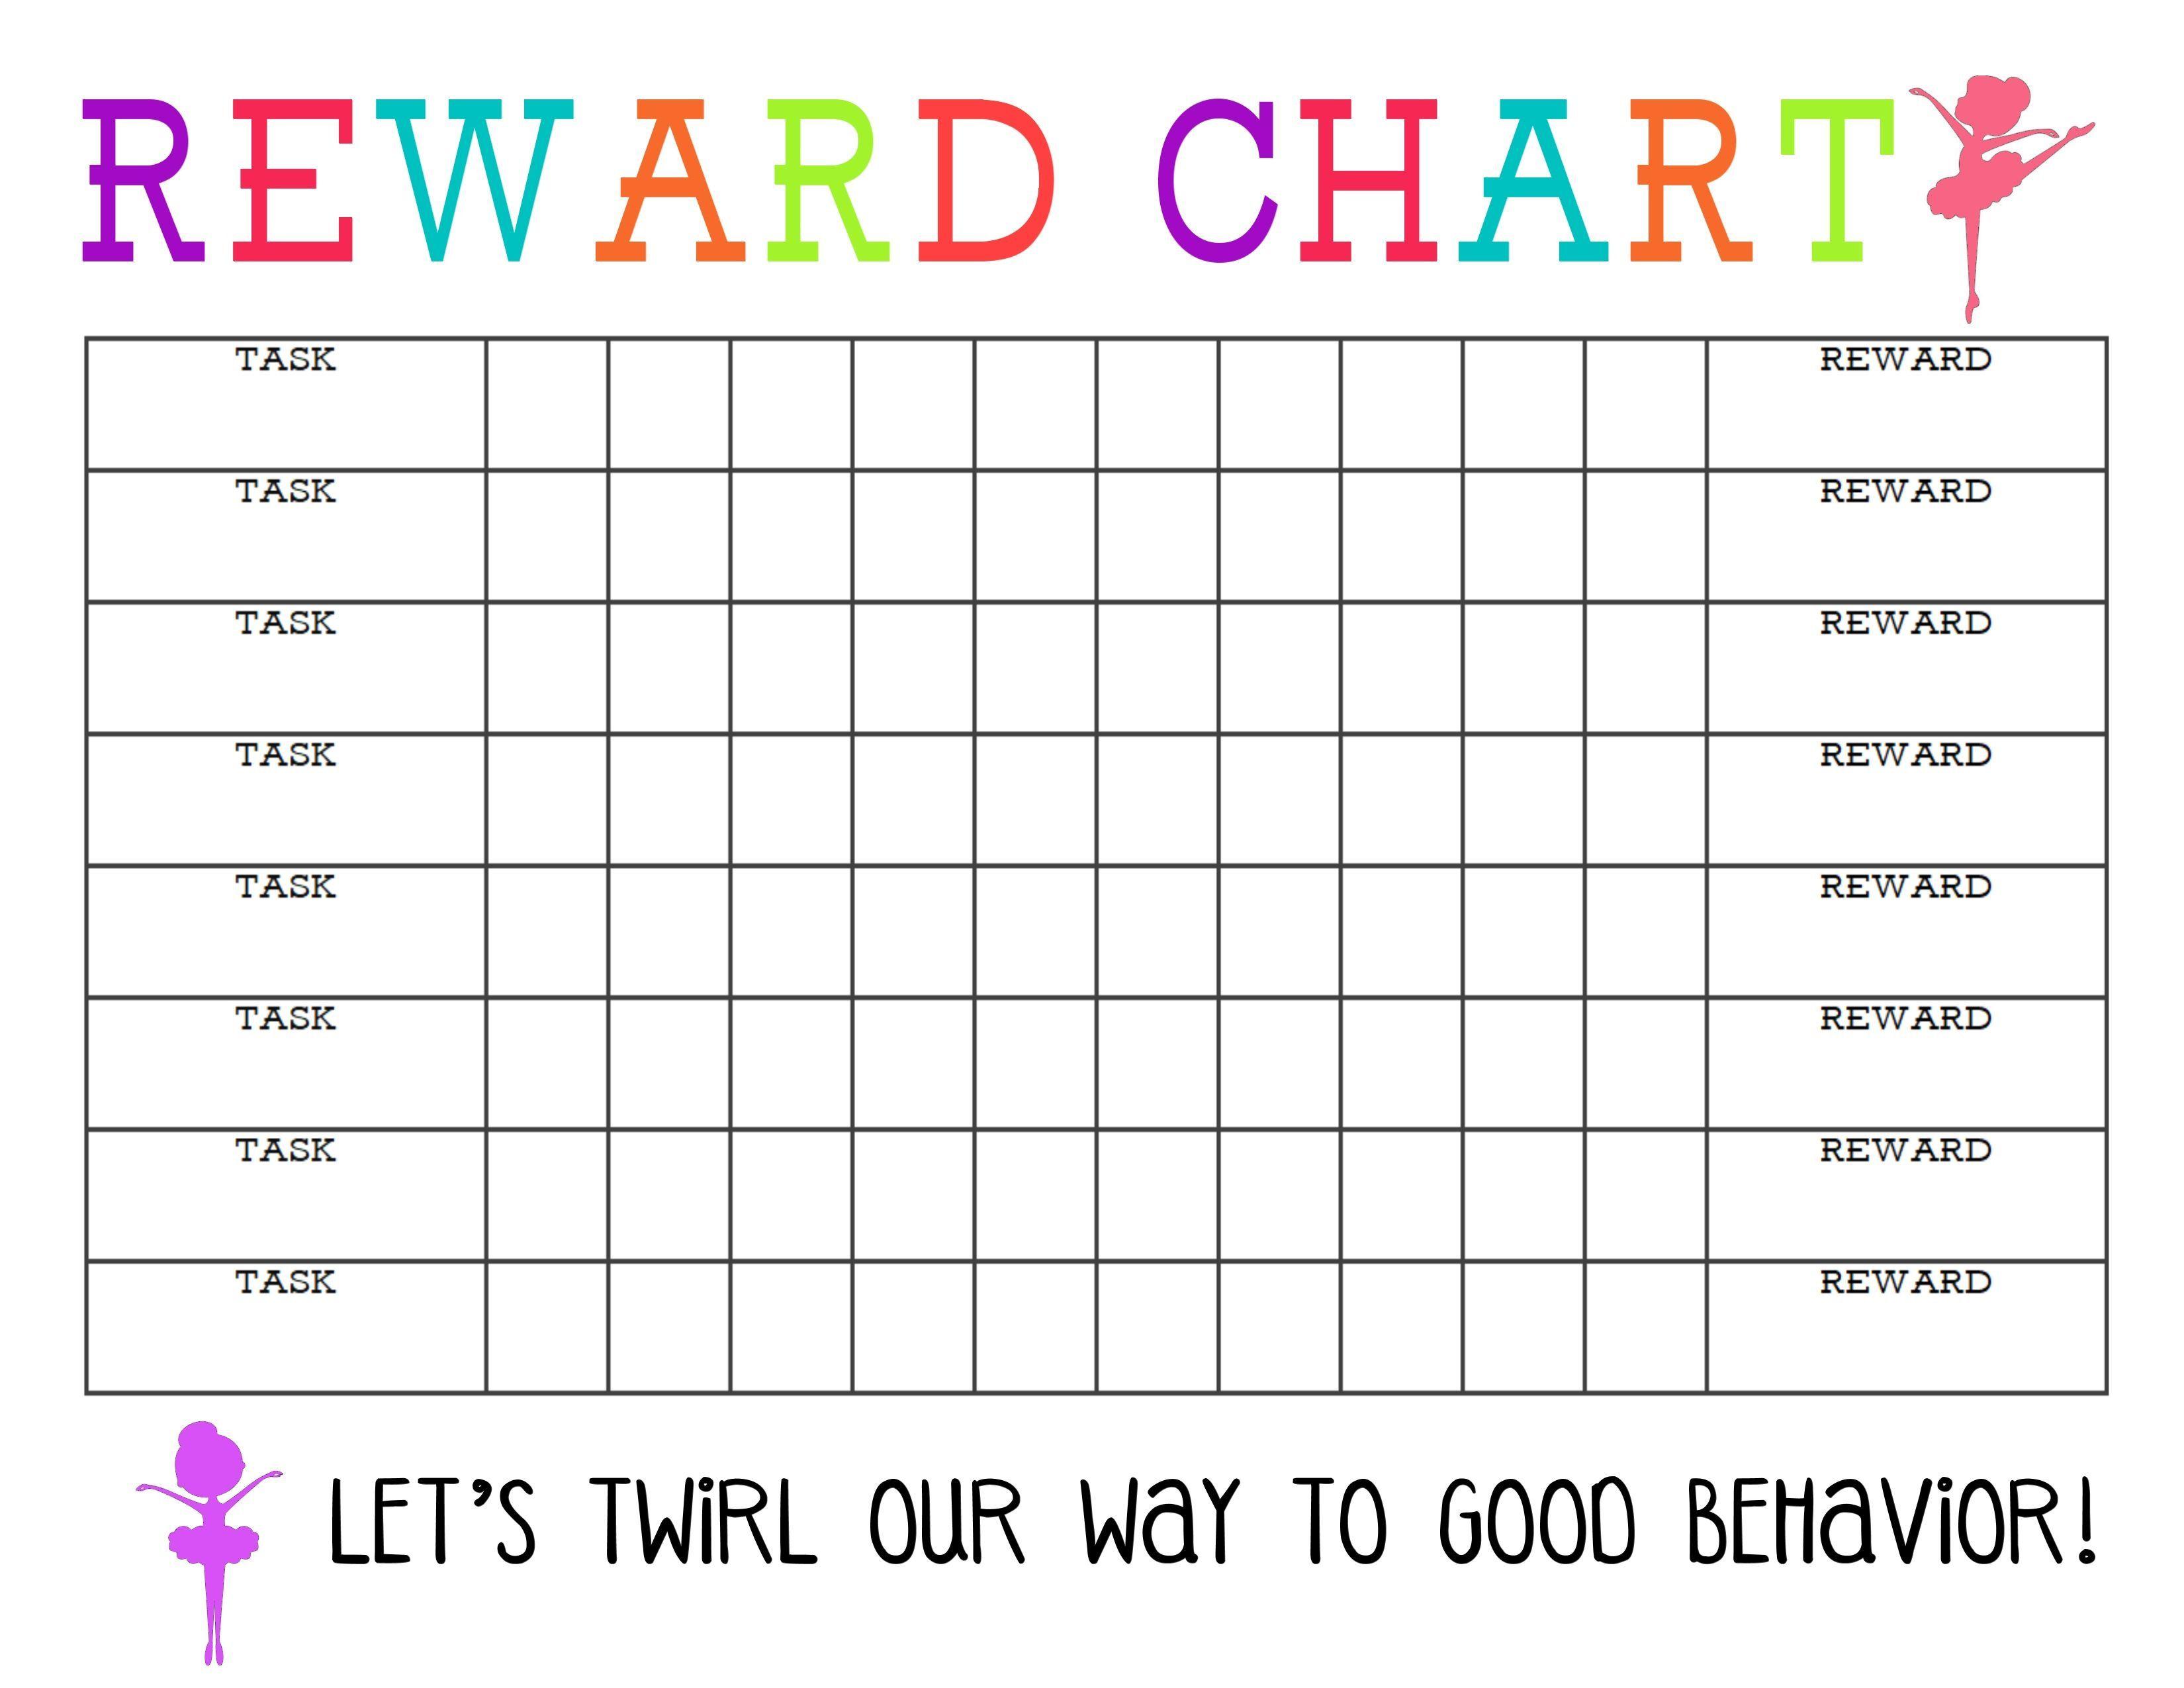 005 Striking Weekly Behavior Chart Template Image  Pdf ClassroomFull